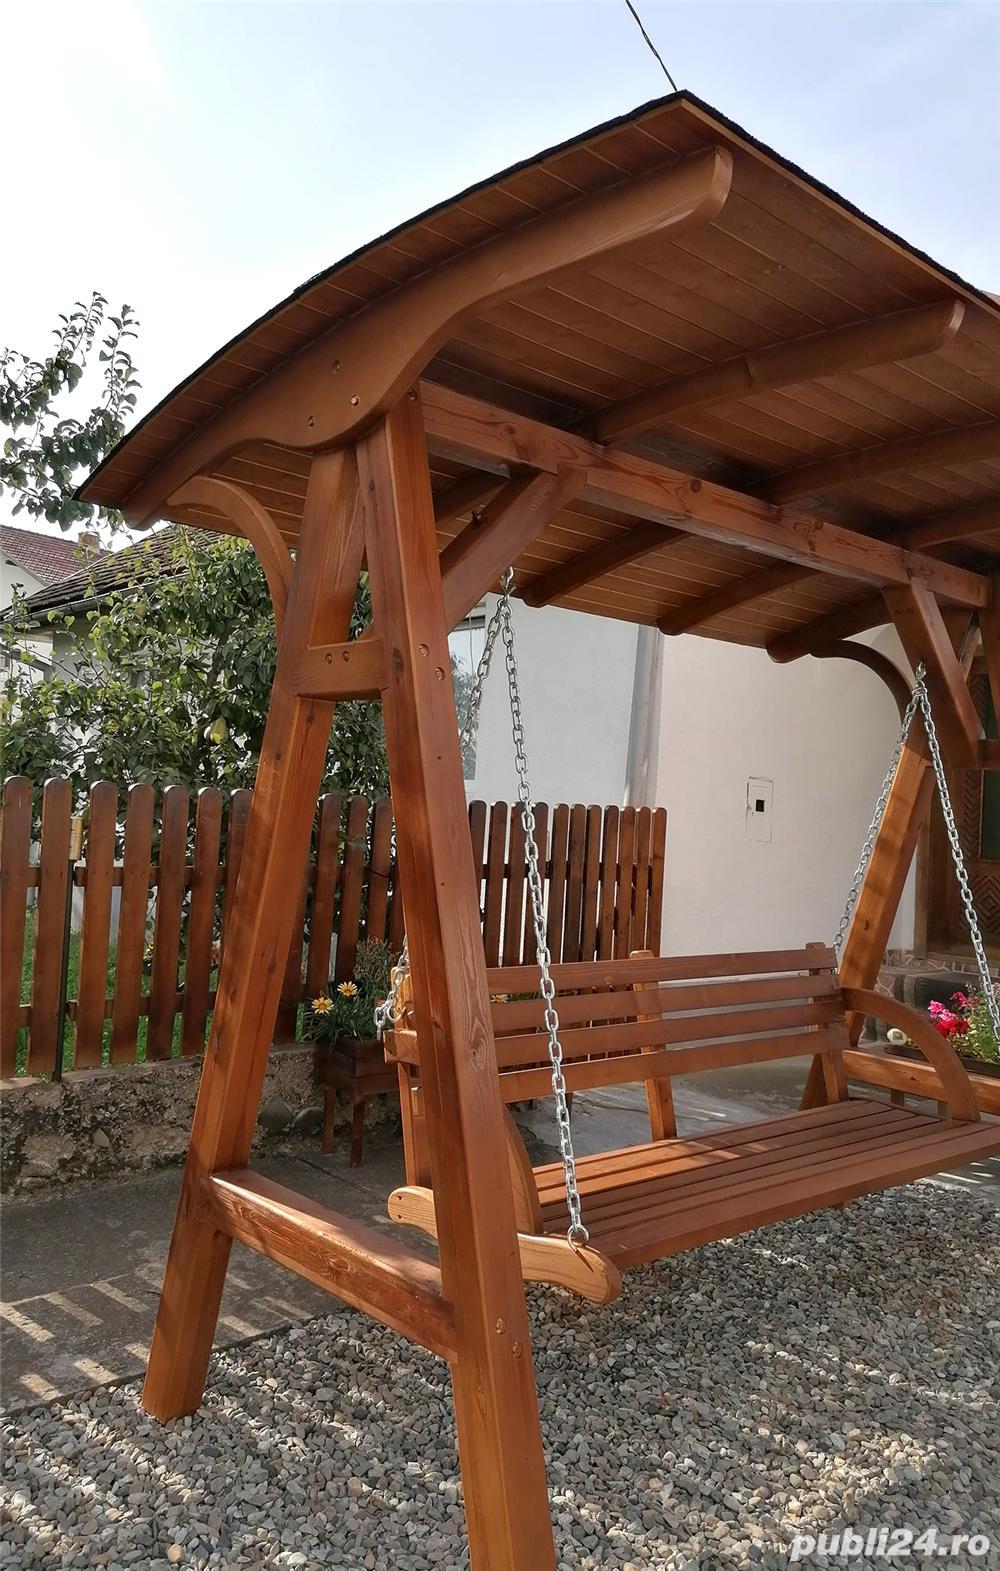 Balansoar Leagan Relax Din Lemn Stratificat Brasov Casa Si Gradina Publi24 Ro